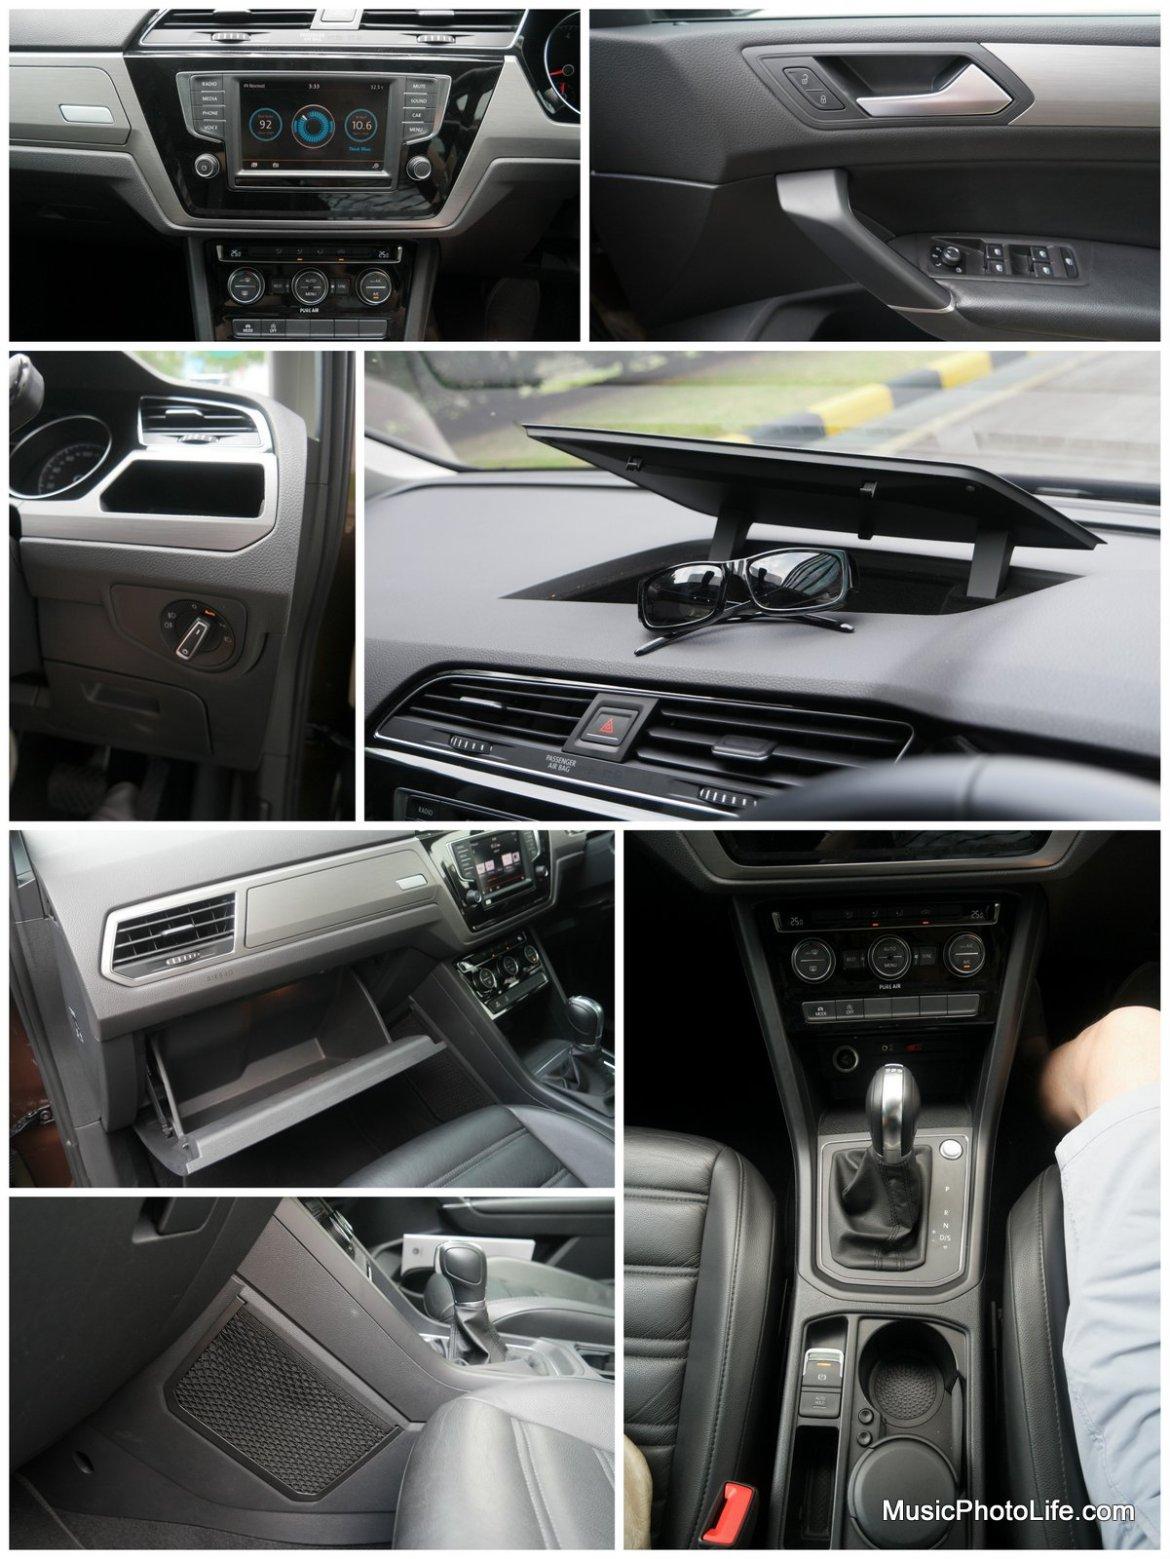 Volkswagen Touran interior details